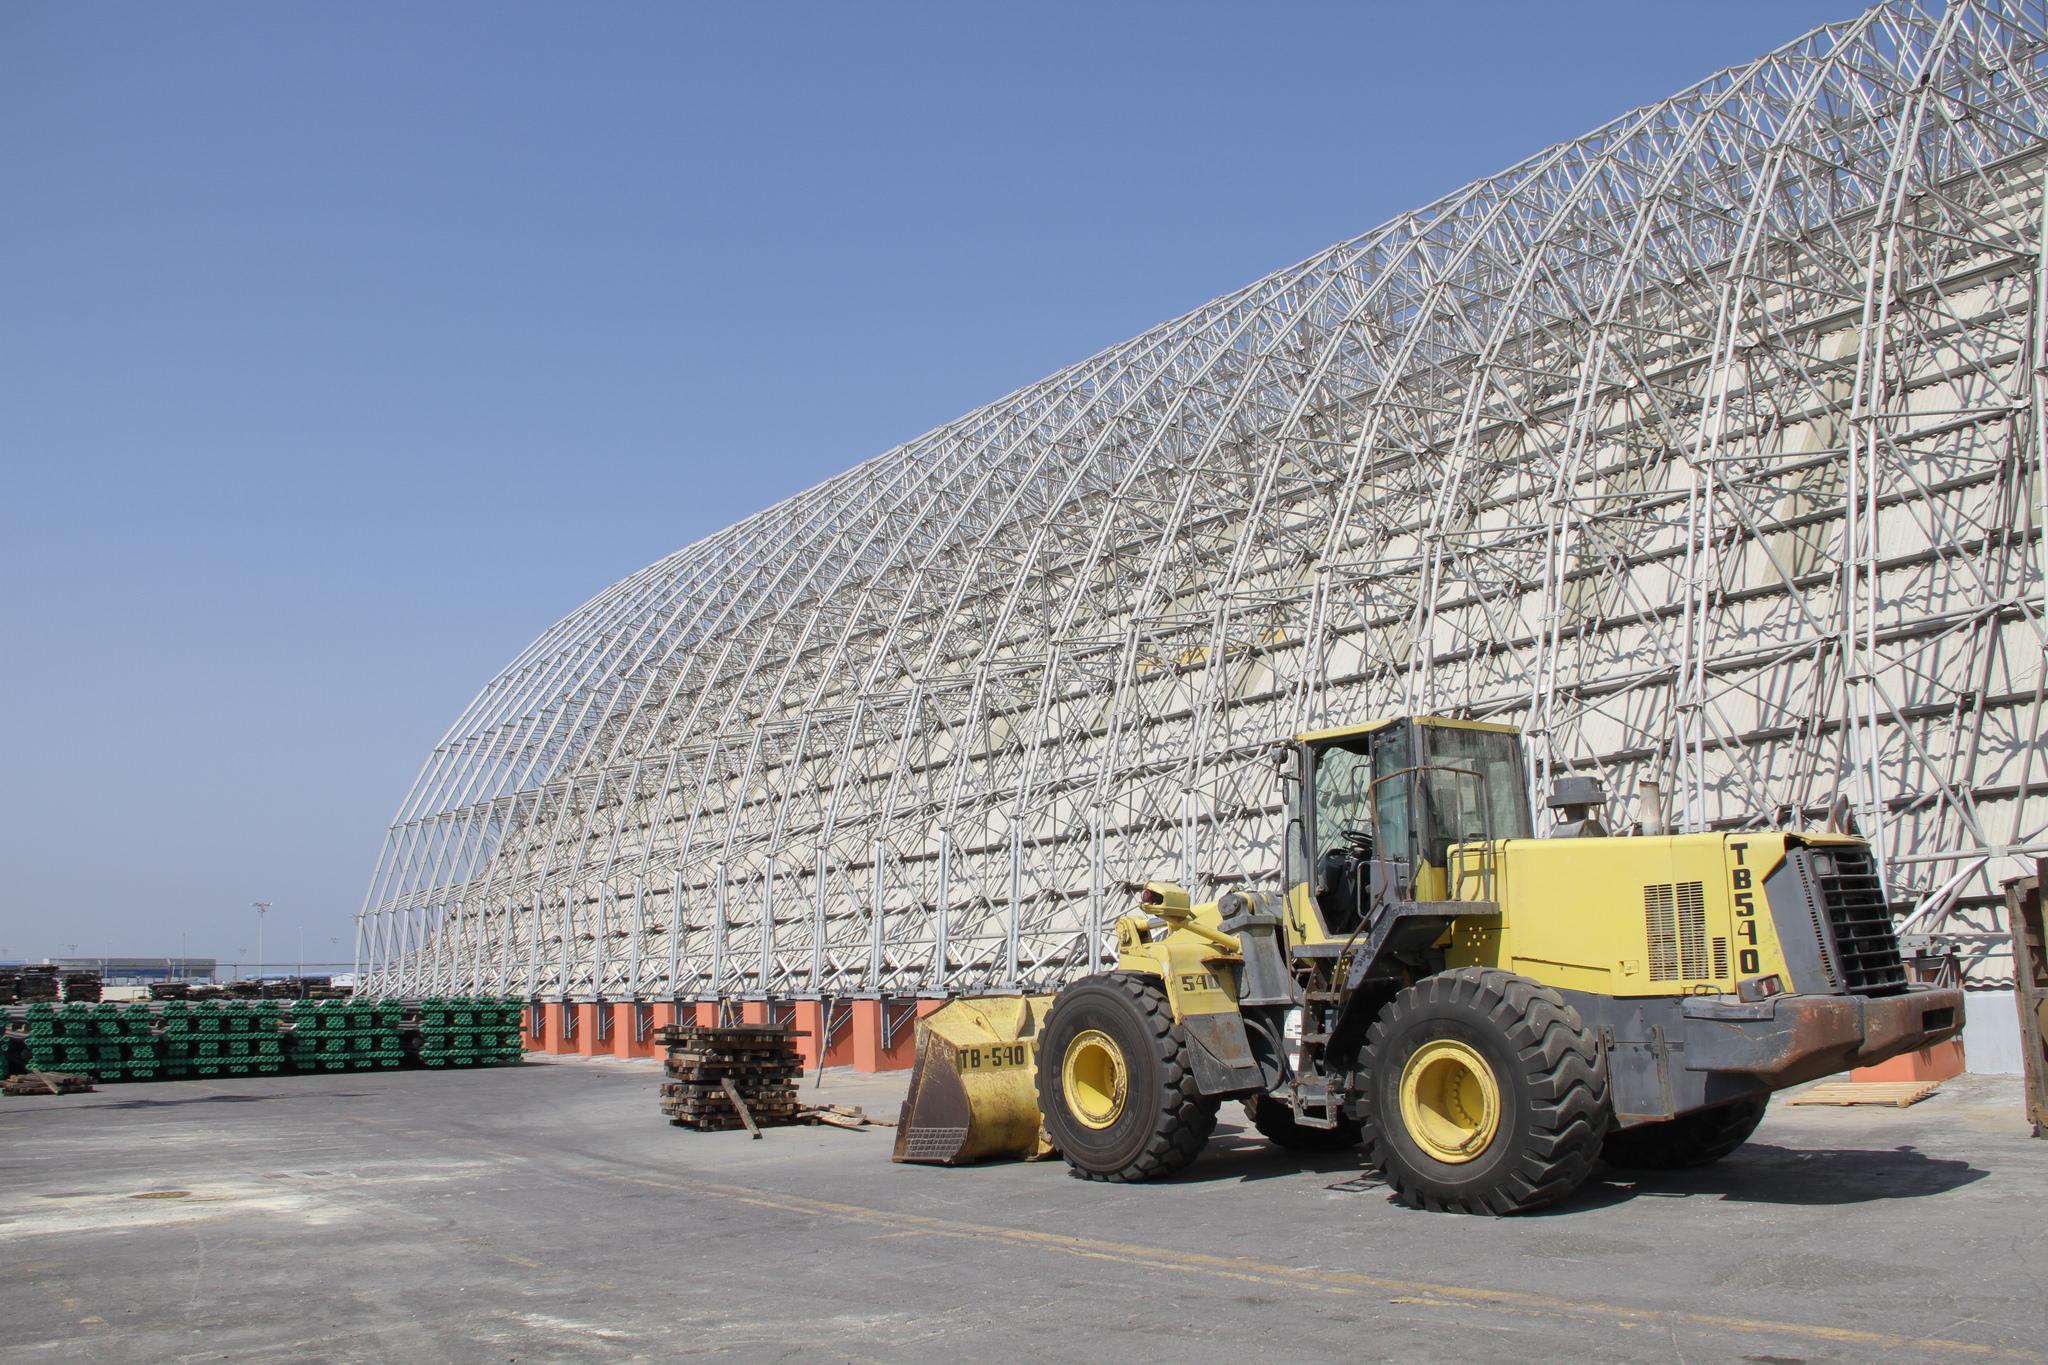 Urea dome, 122m x 54m, Veracruz, Mexico